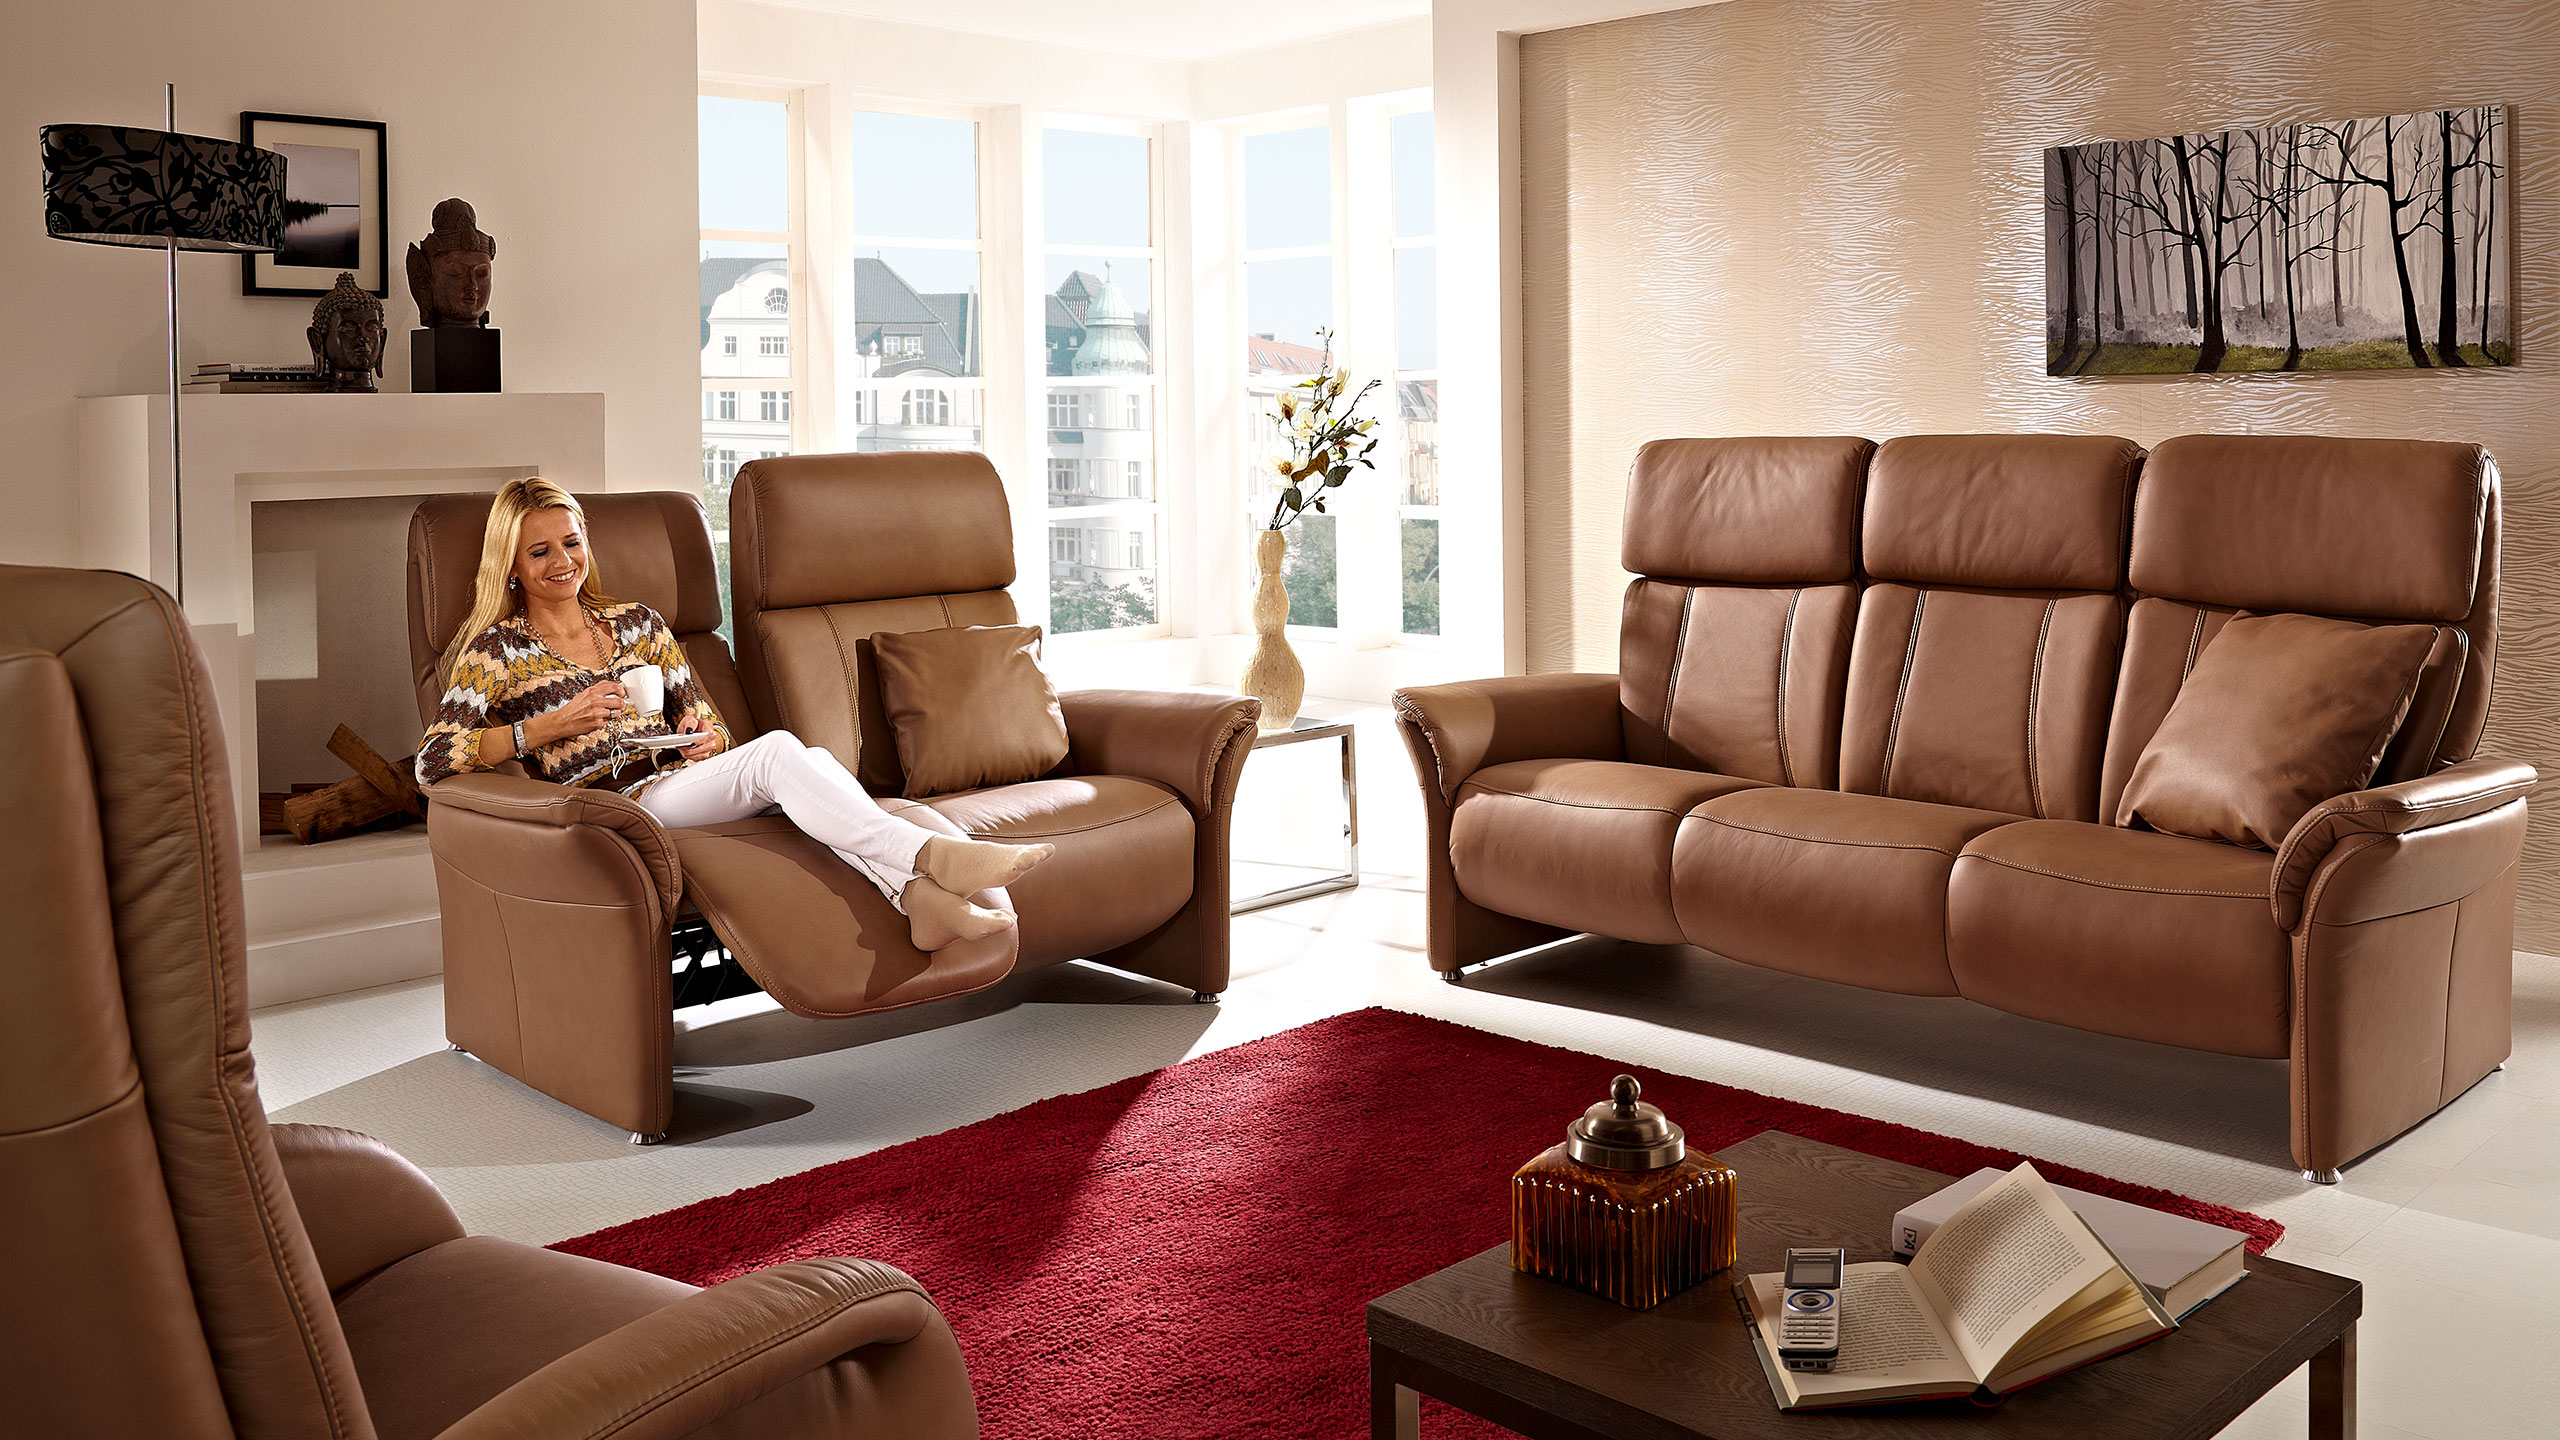 Magic Comfort Sofa 209 cm Leder Braun